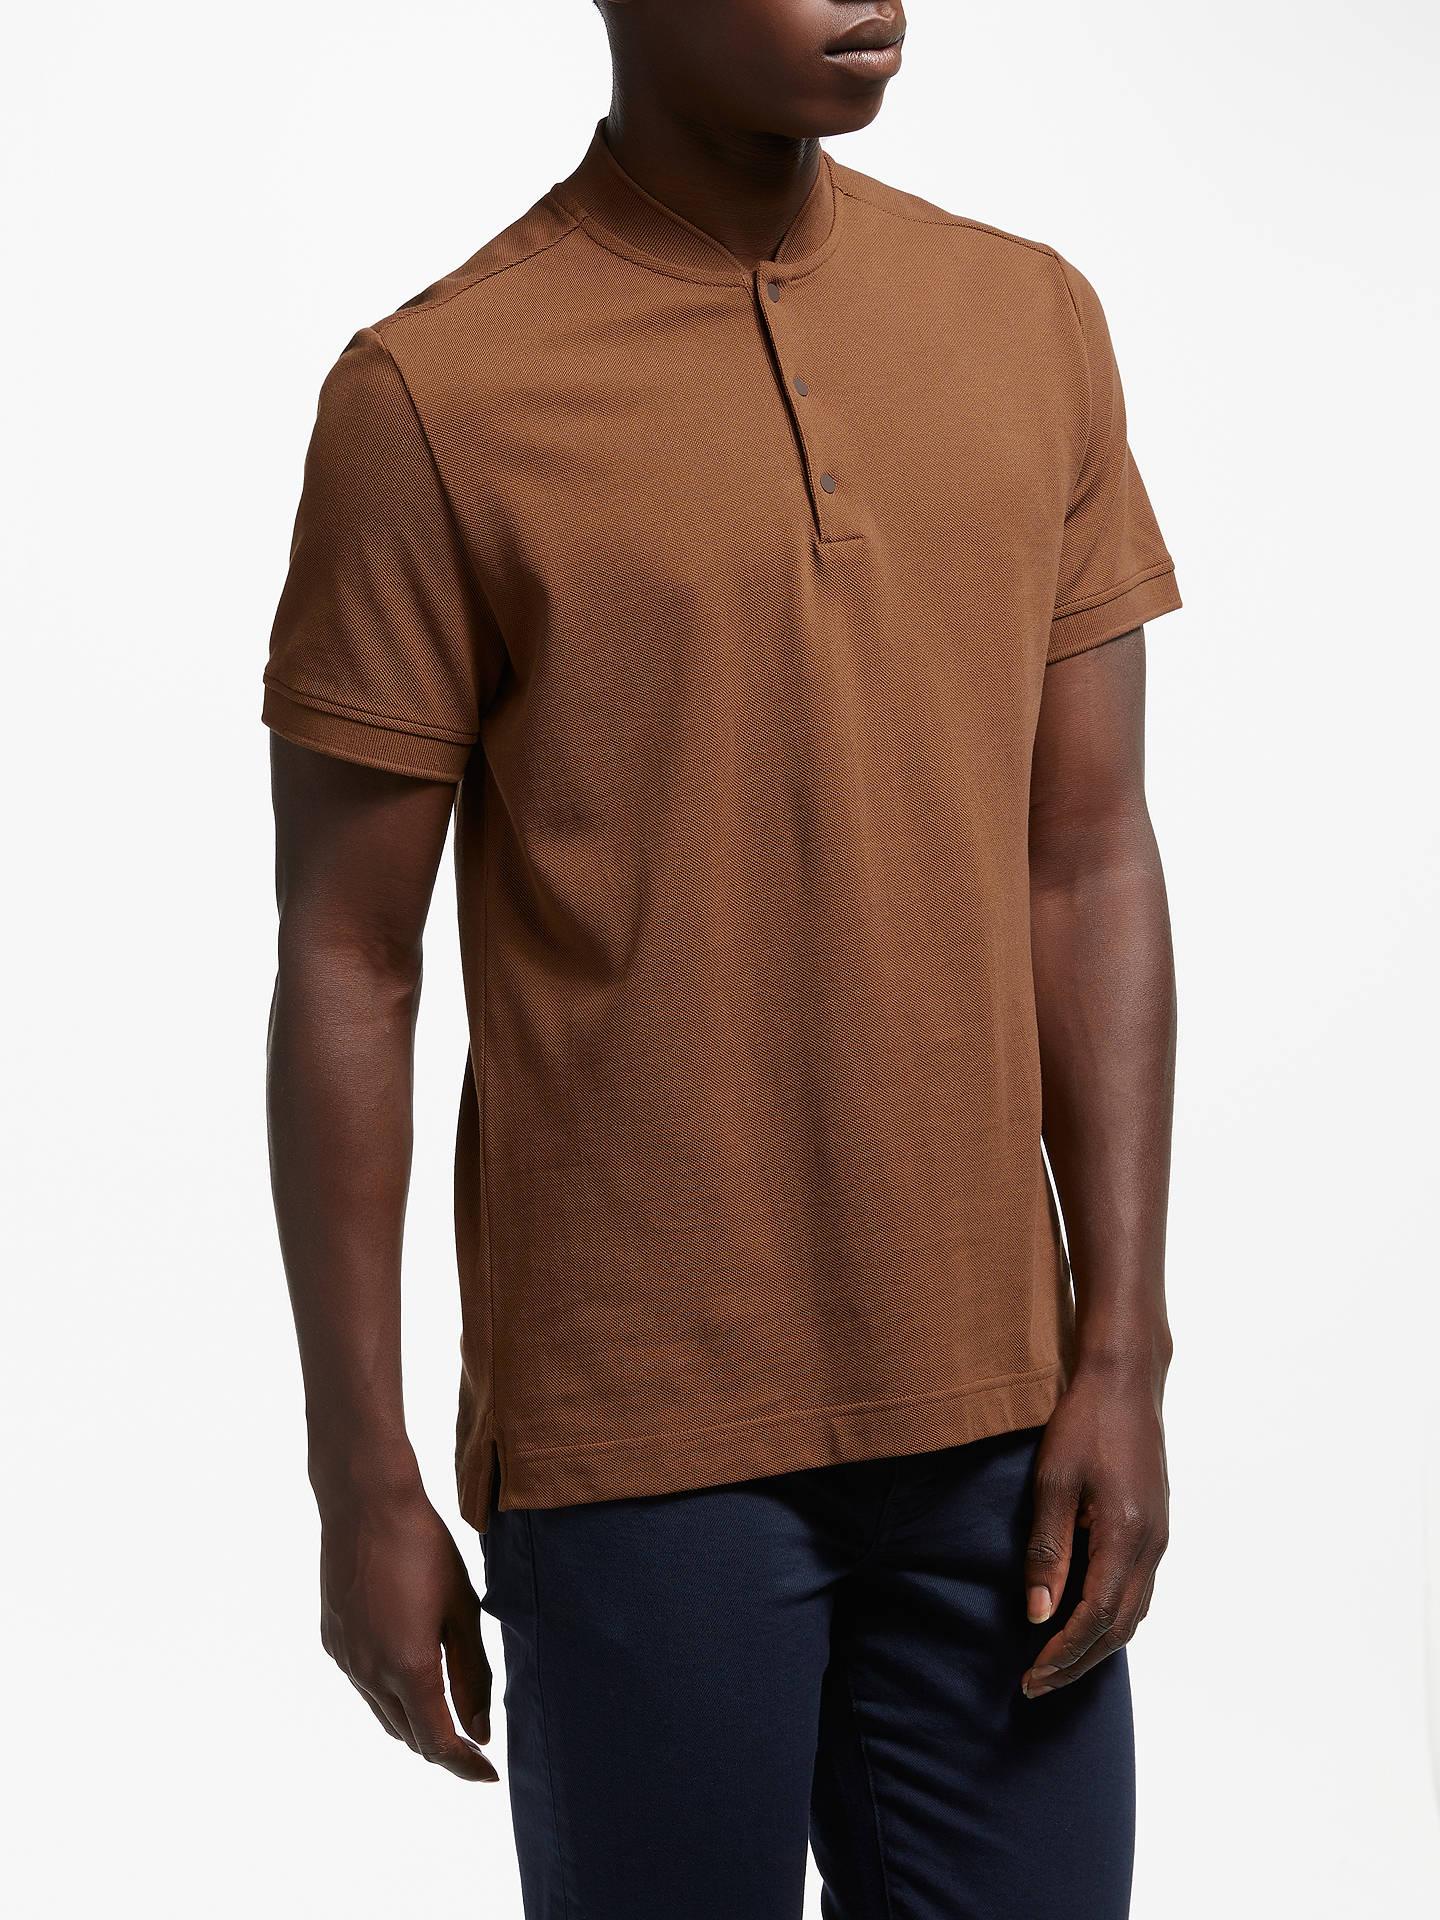 3aaf09122 Buy J.Lindeberg Leo Pique Polo Shirt